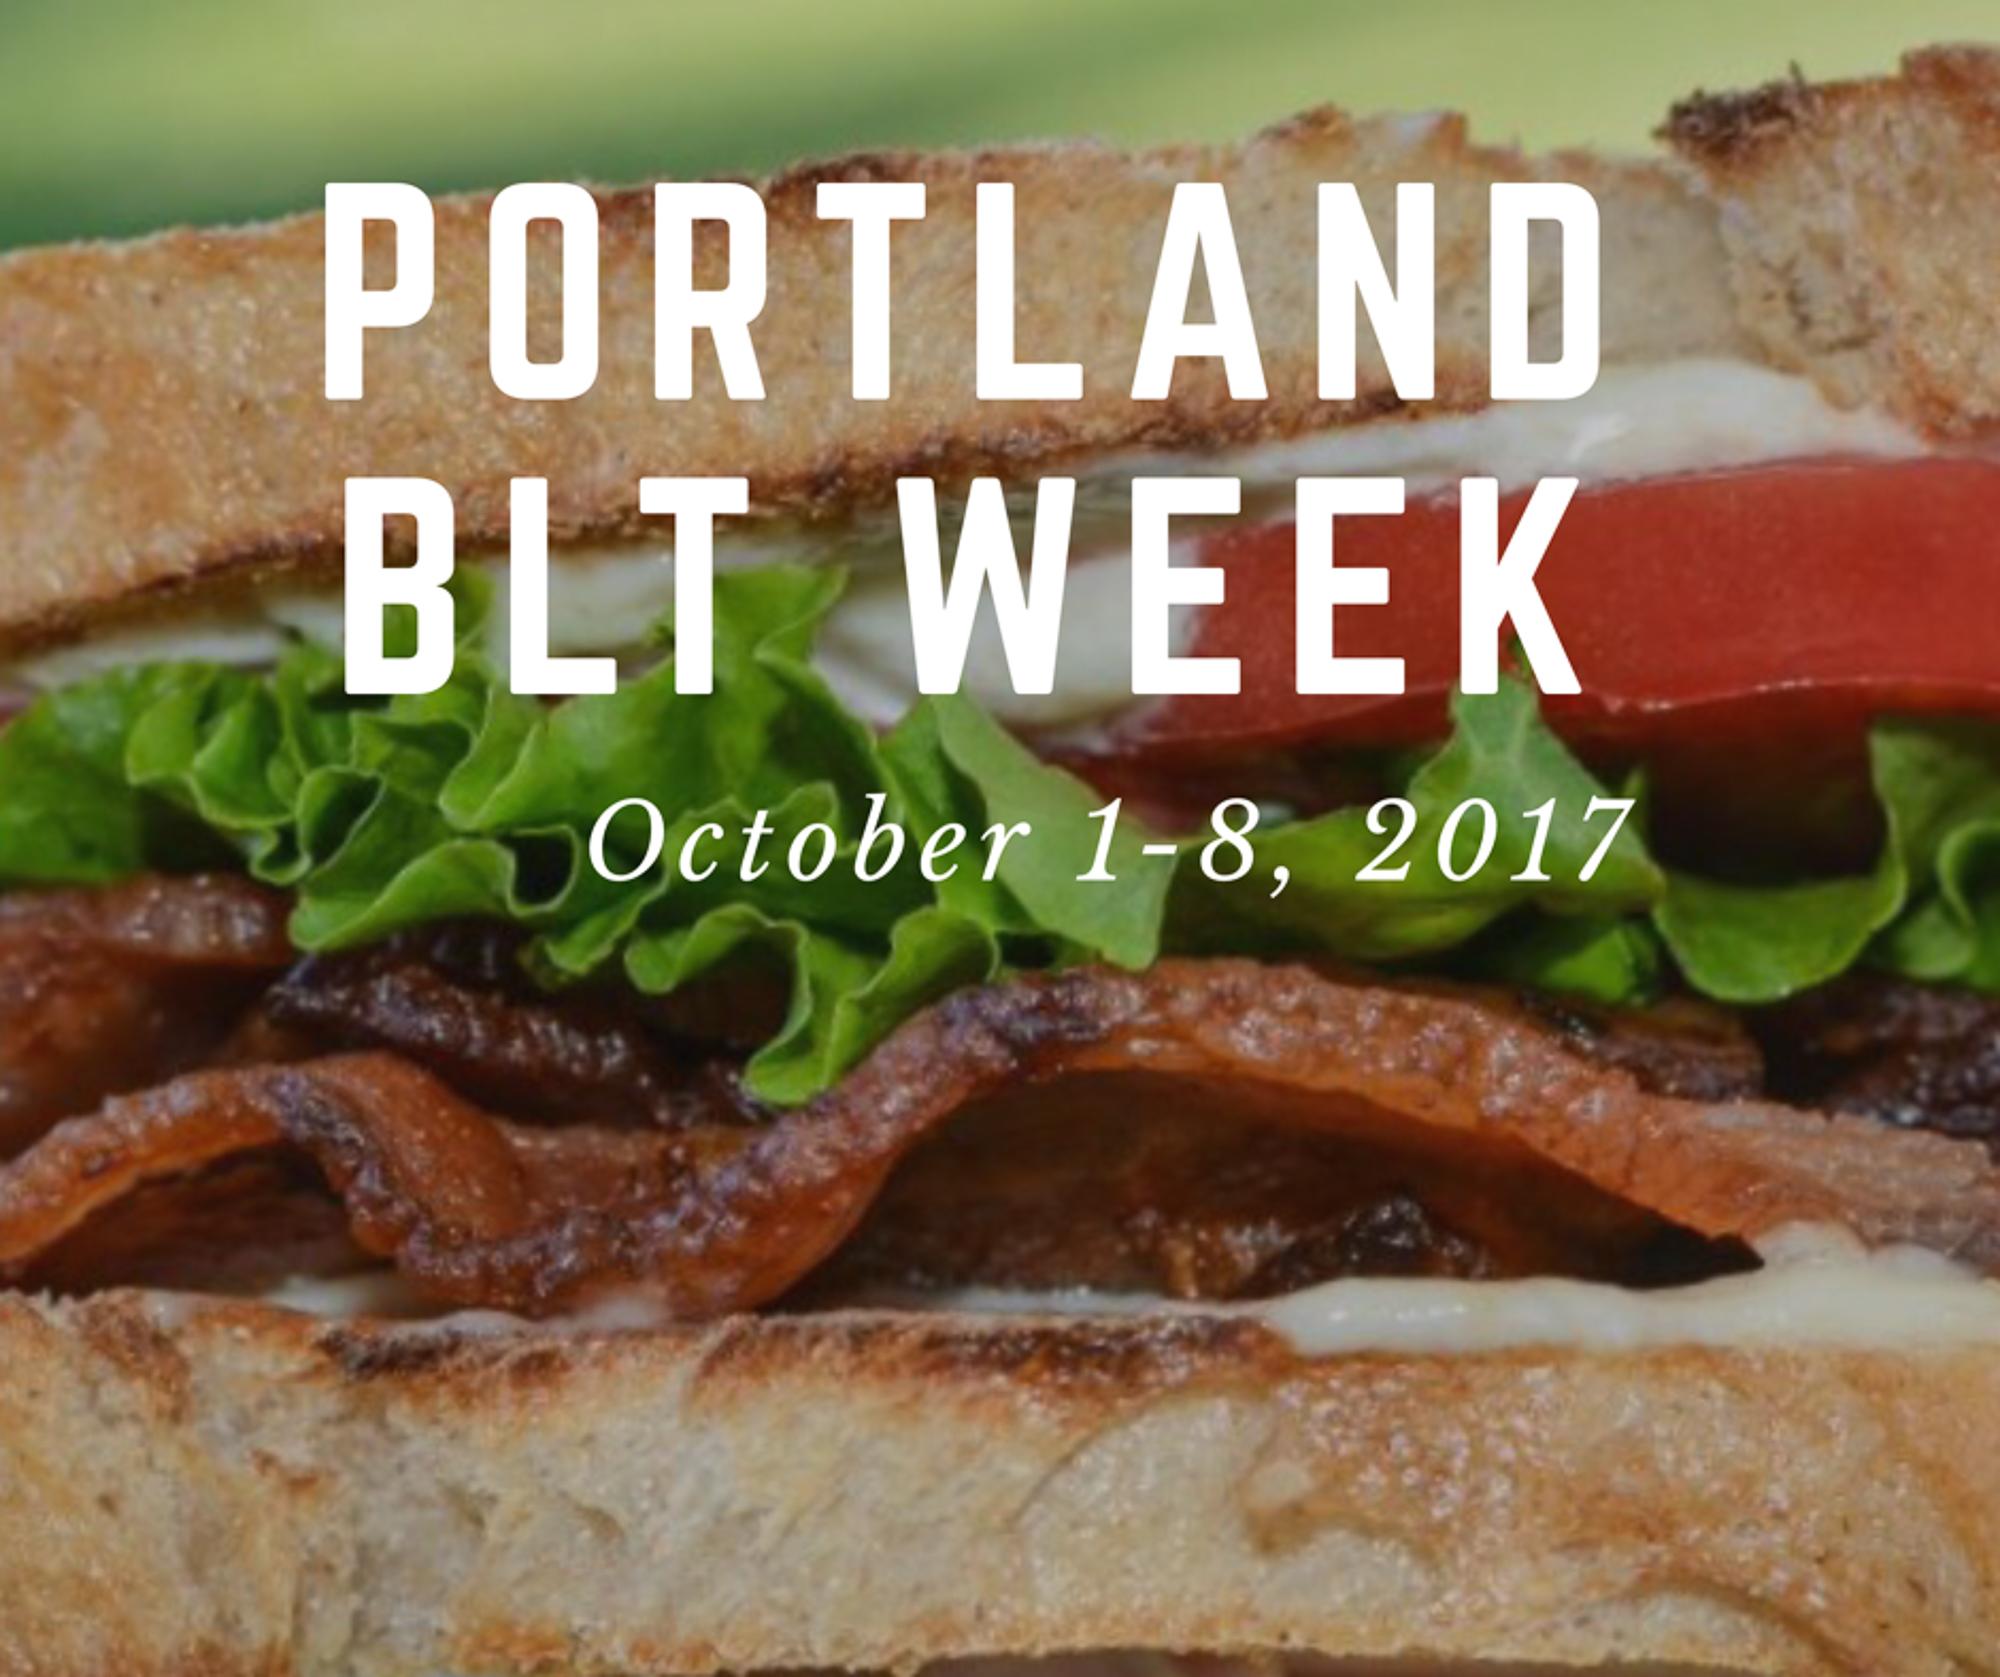 Portland BLT Week